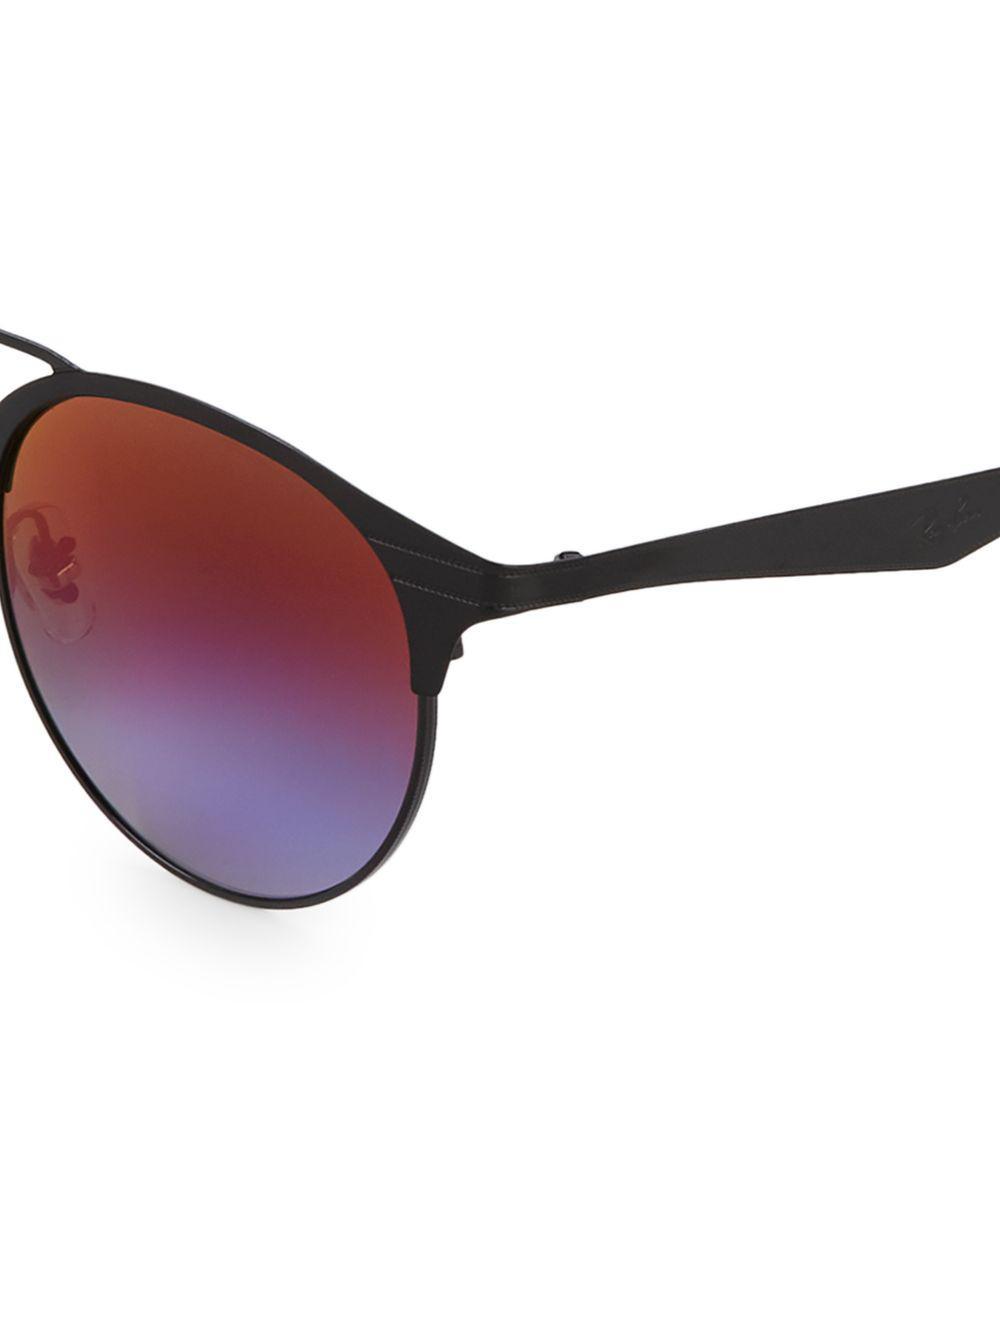 e343d589fae Ray-Ban - Black 51mm Round Browline Sunglasses - Lyst. View fullscreen